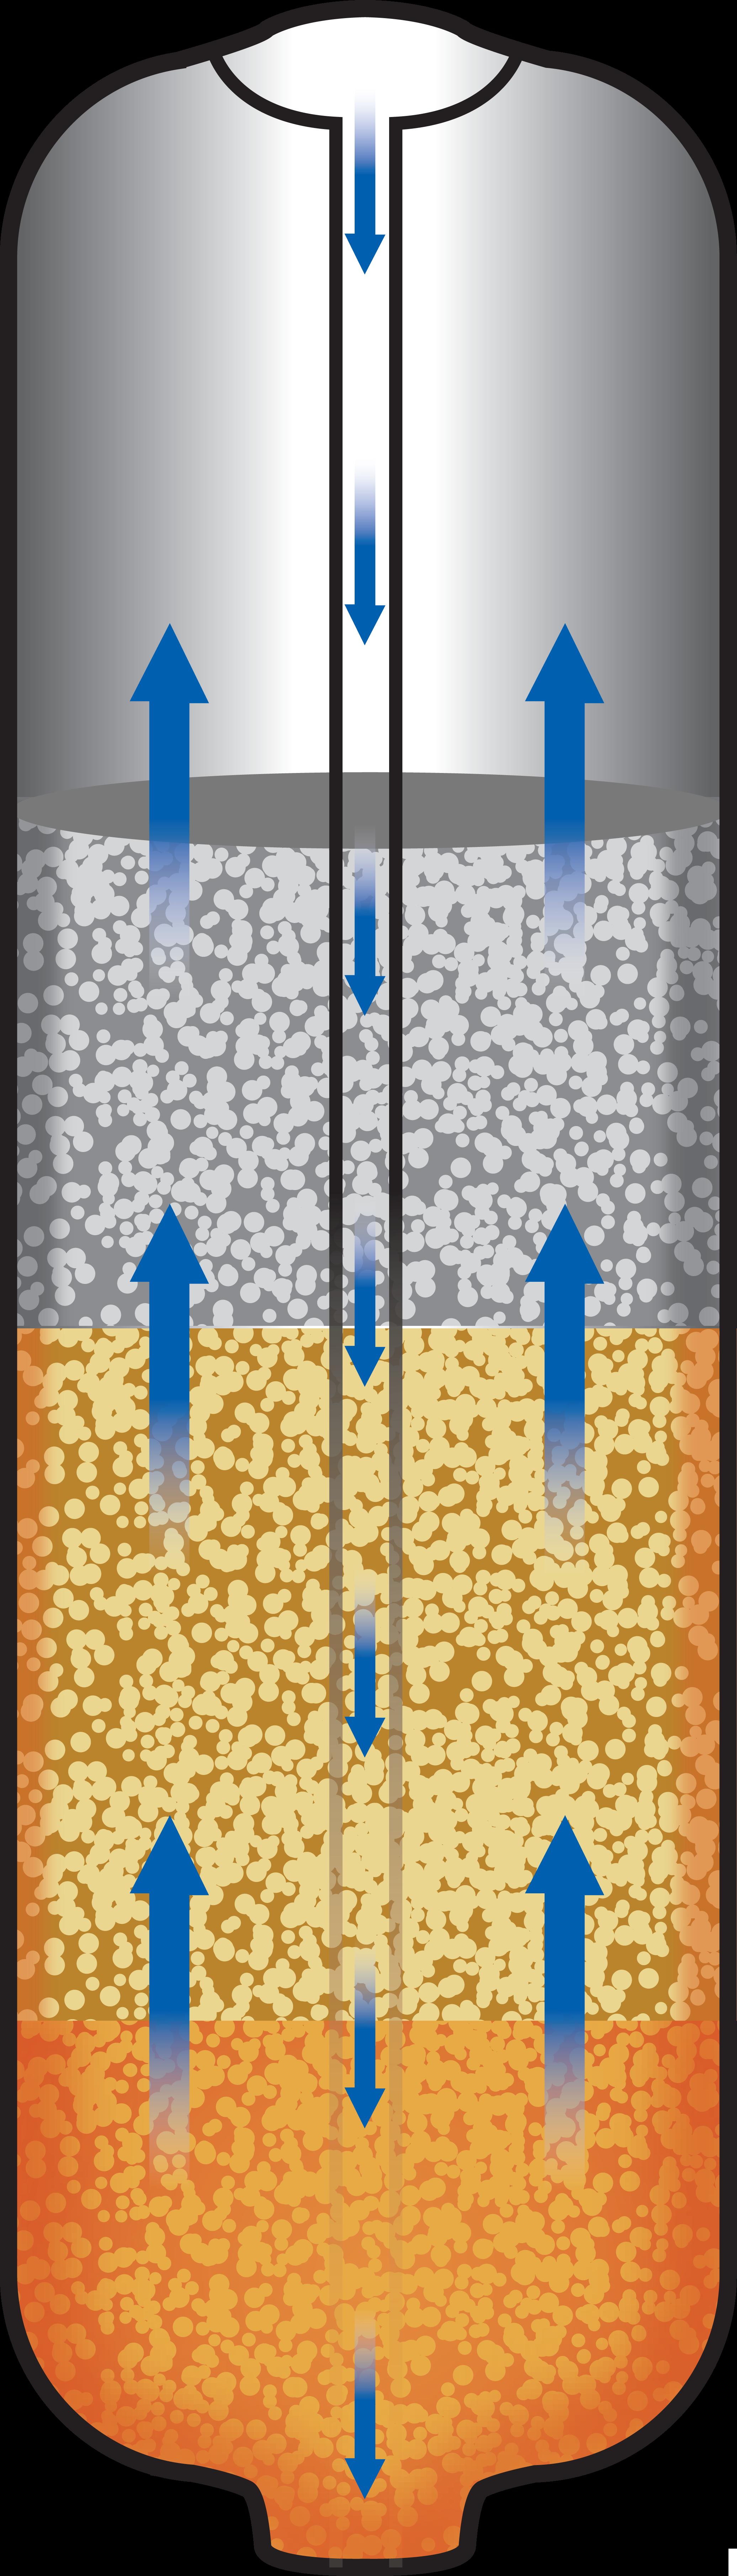 Reverse Flow Regeneration